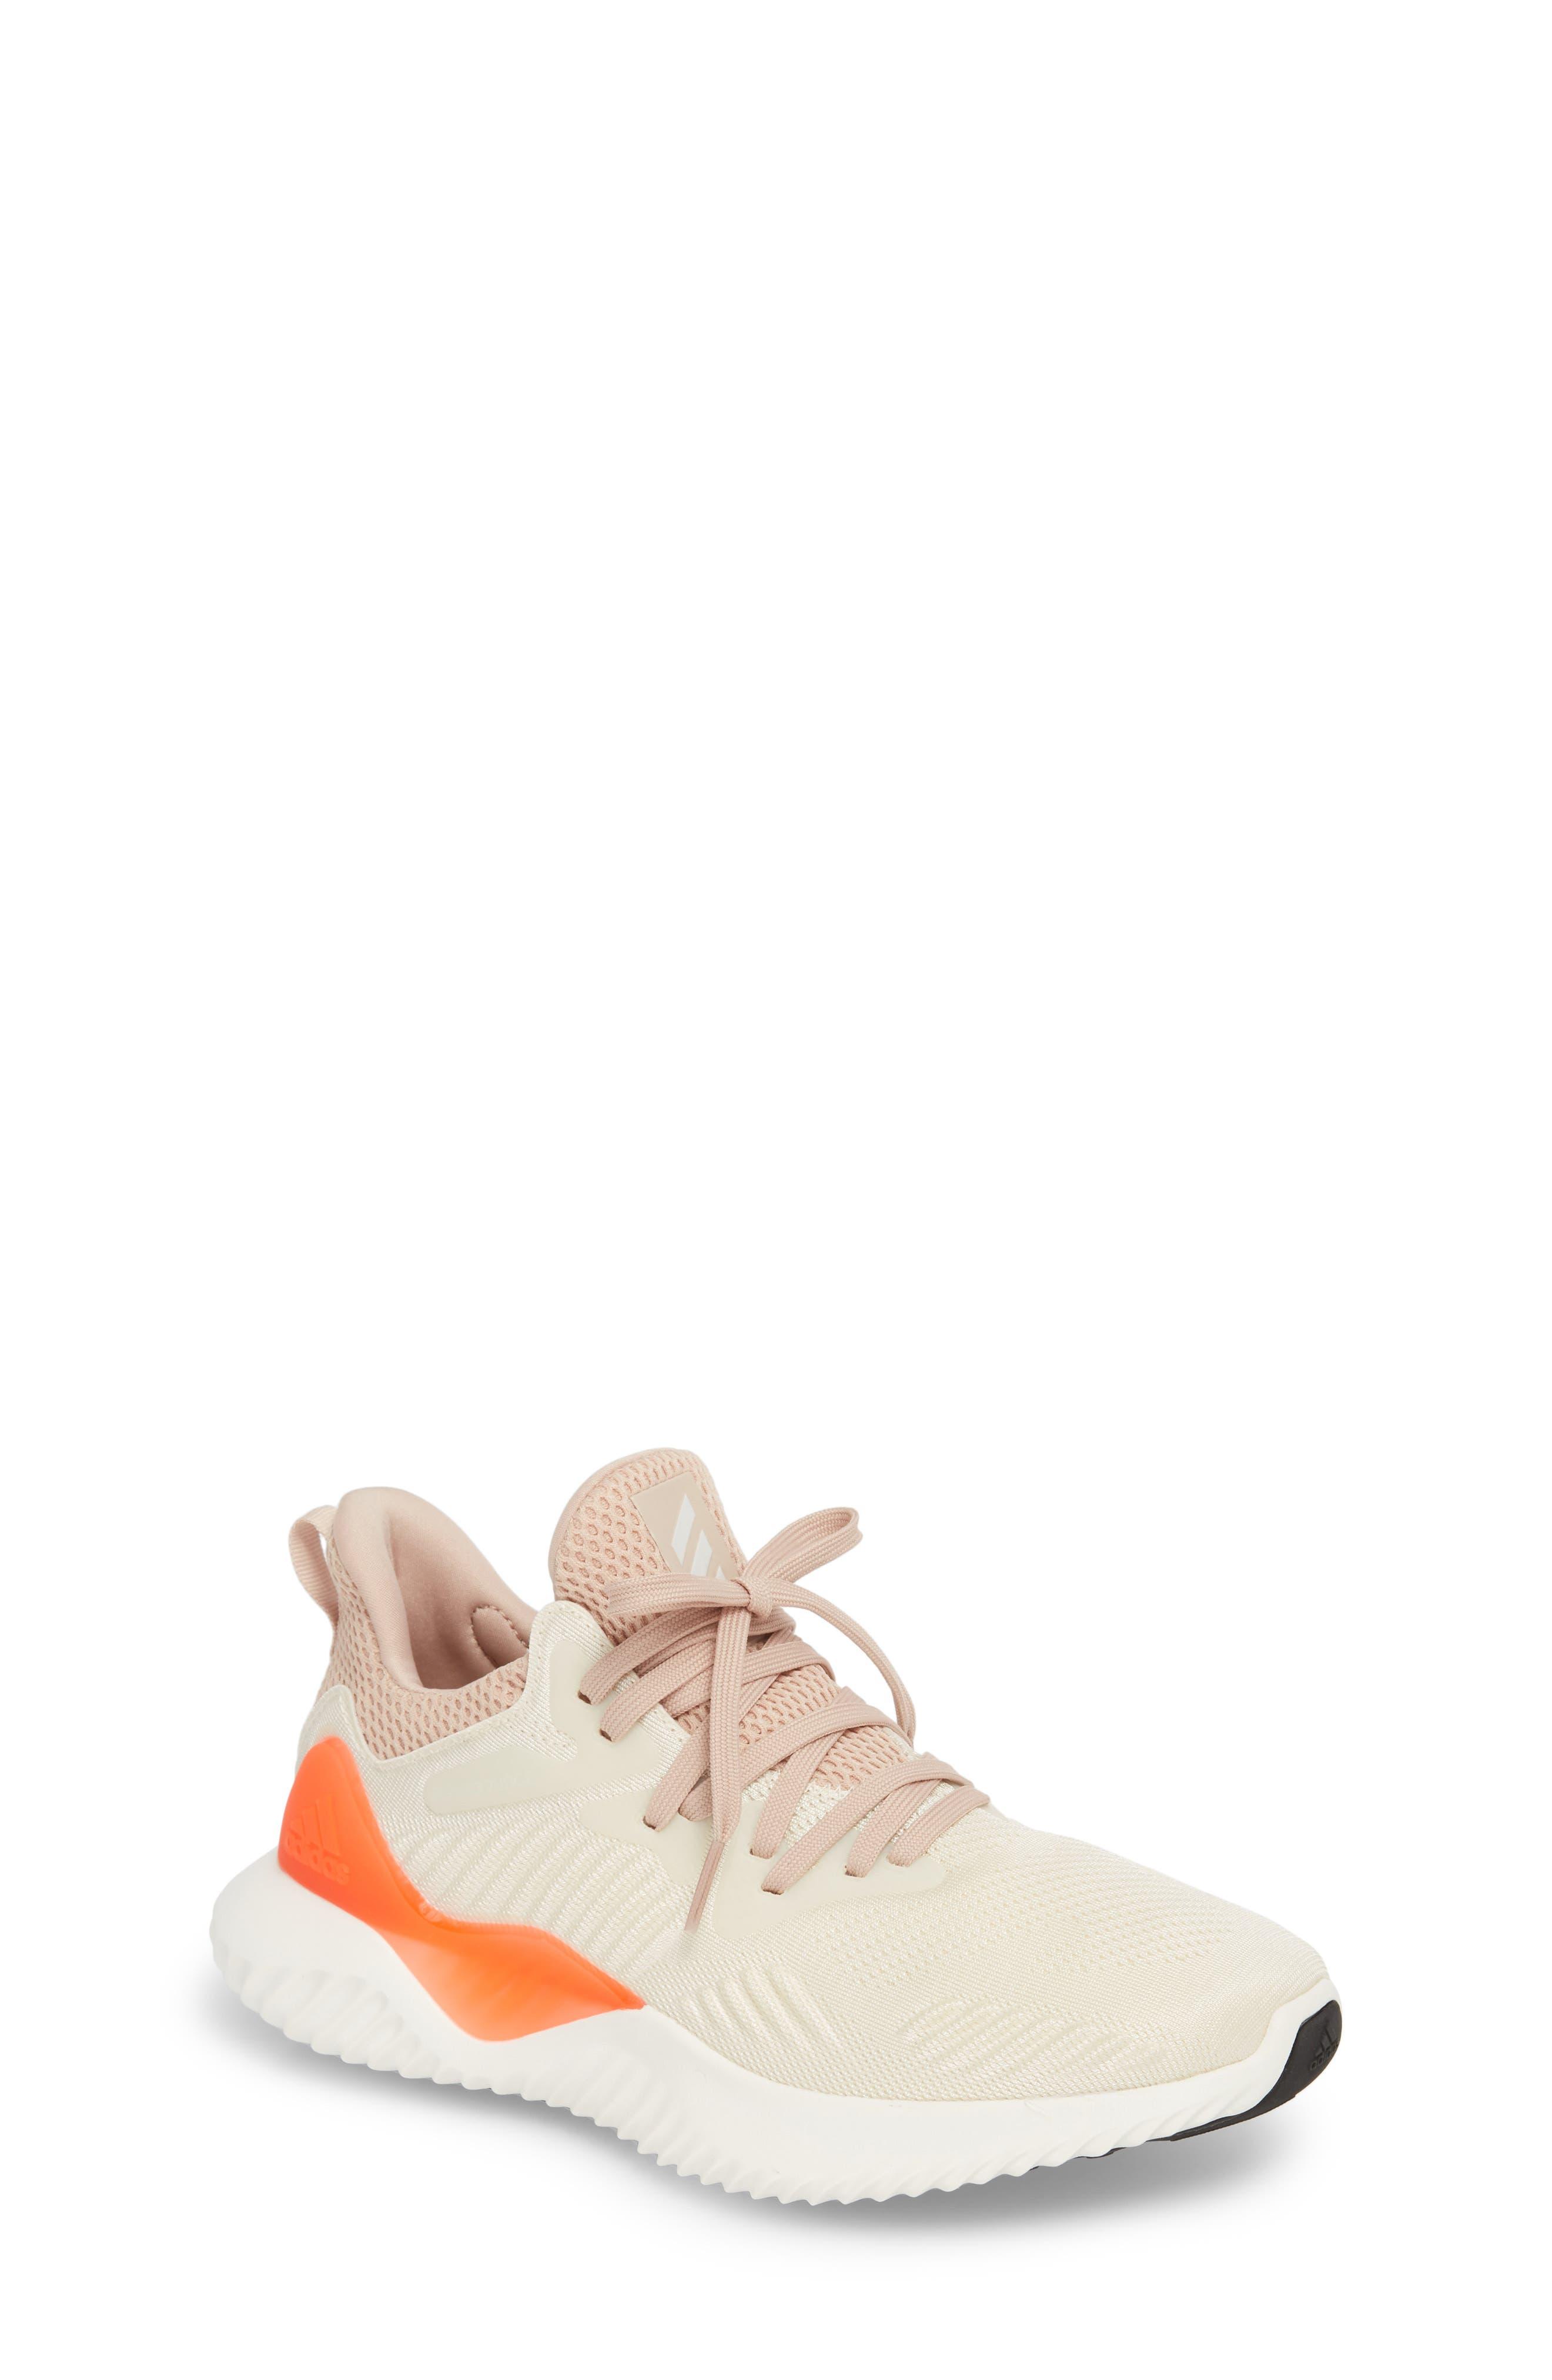 AlphaBounce Beyond Running Shoe,                         Main,                         color, Linen/ Chalk/ Ash Pearl